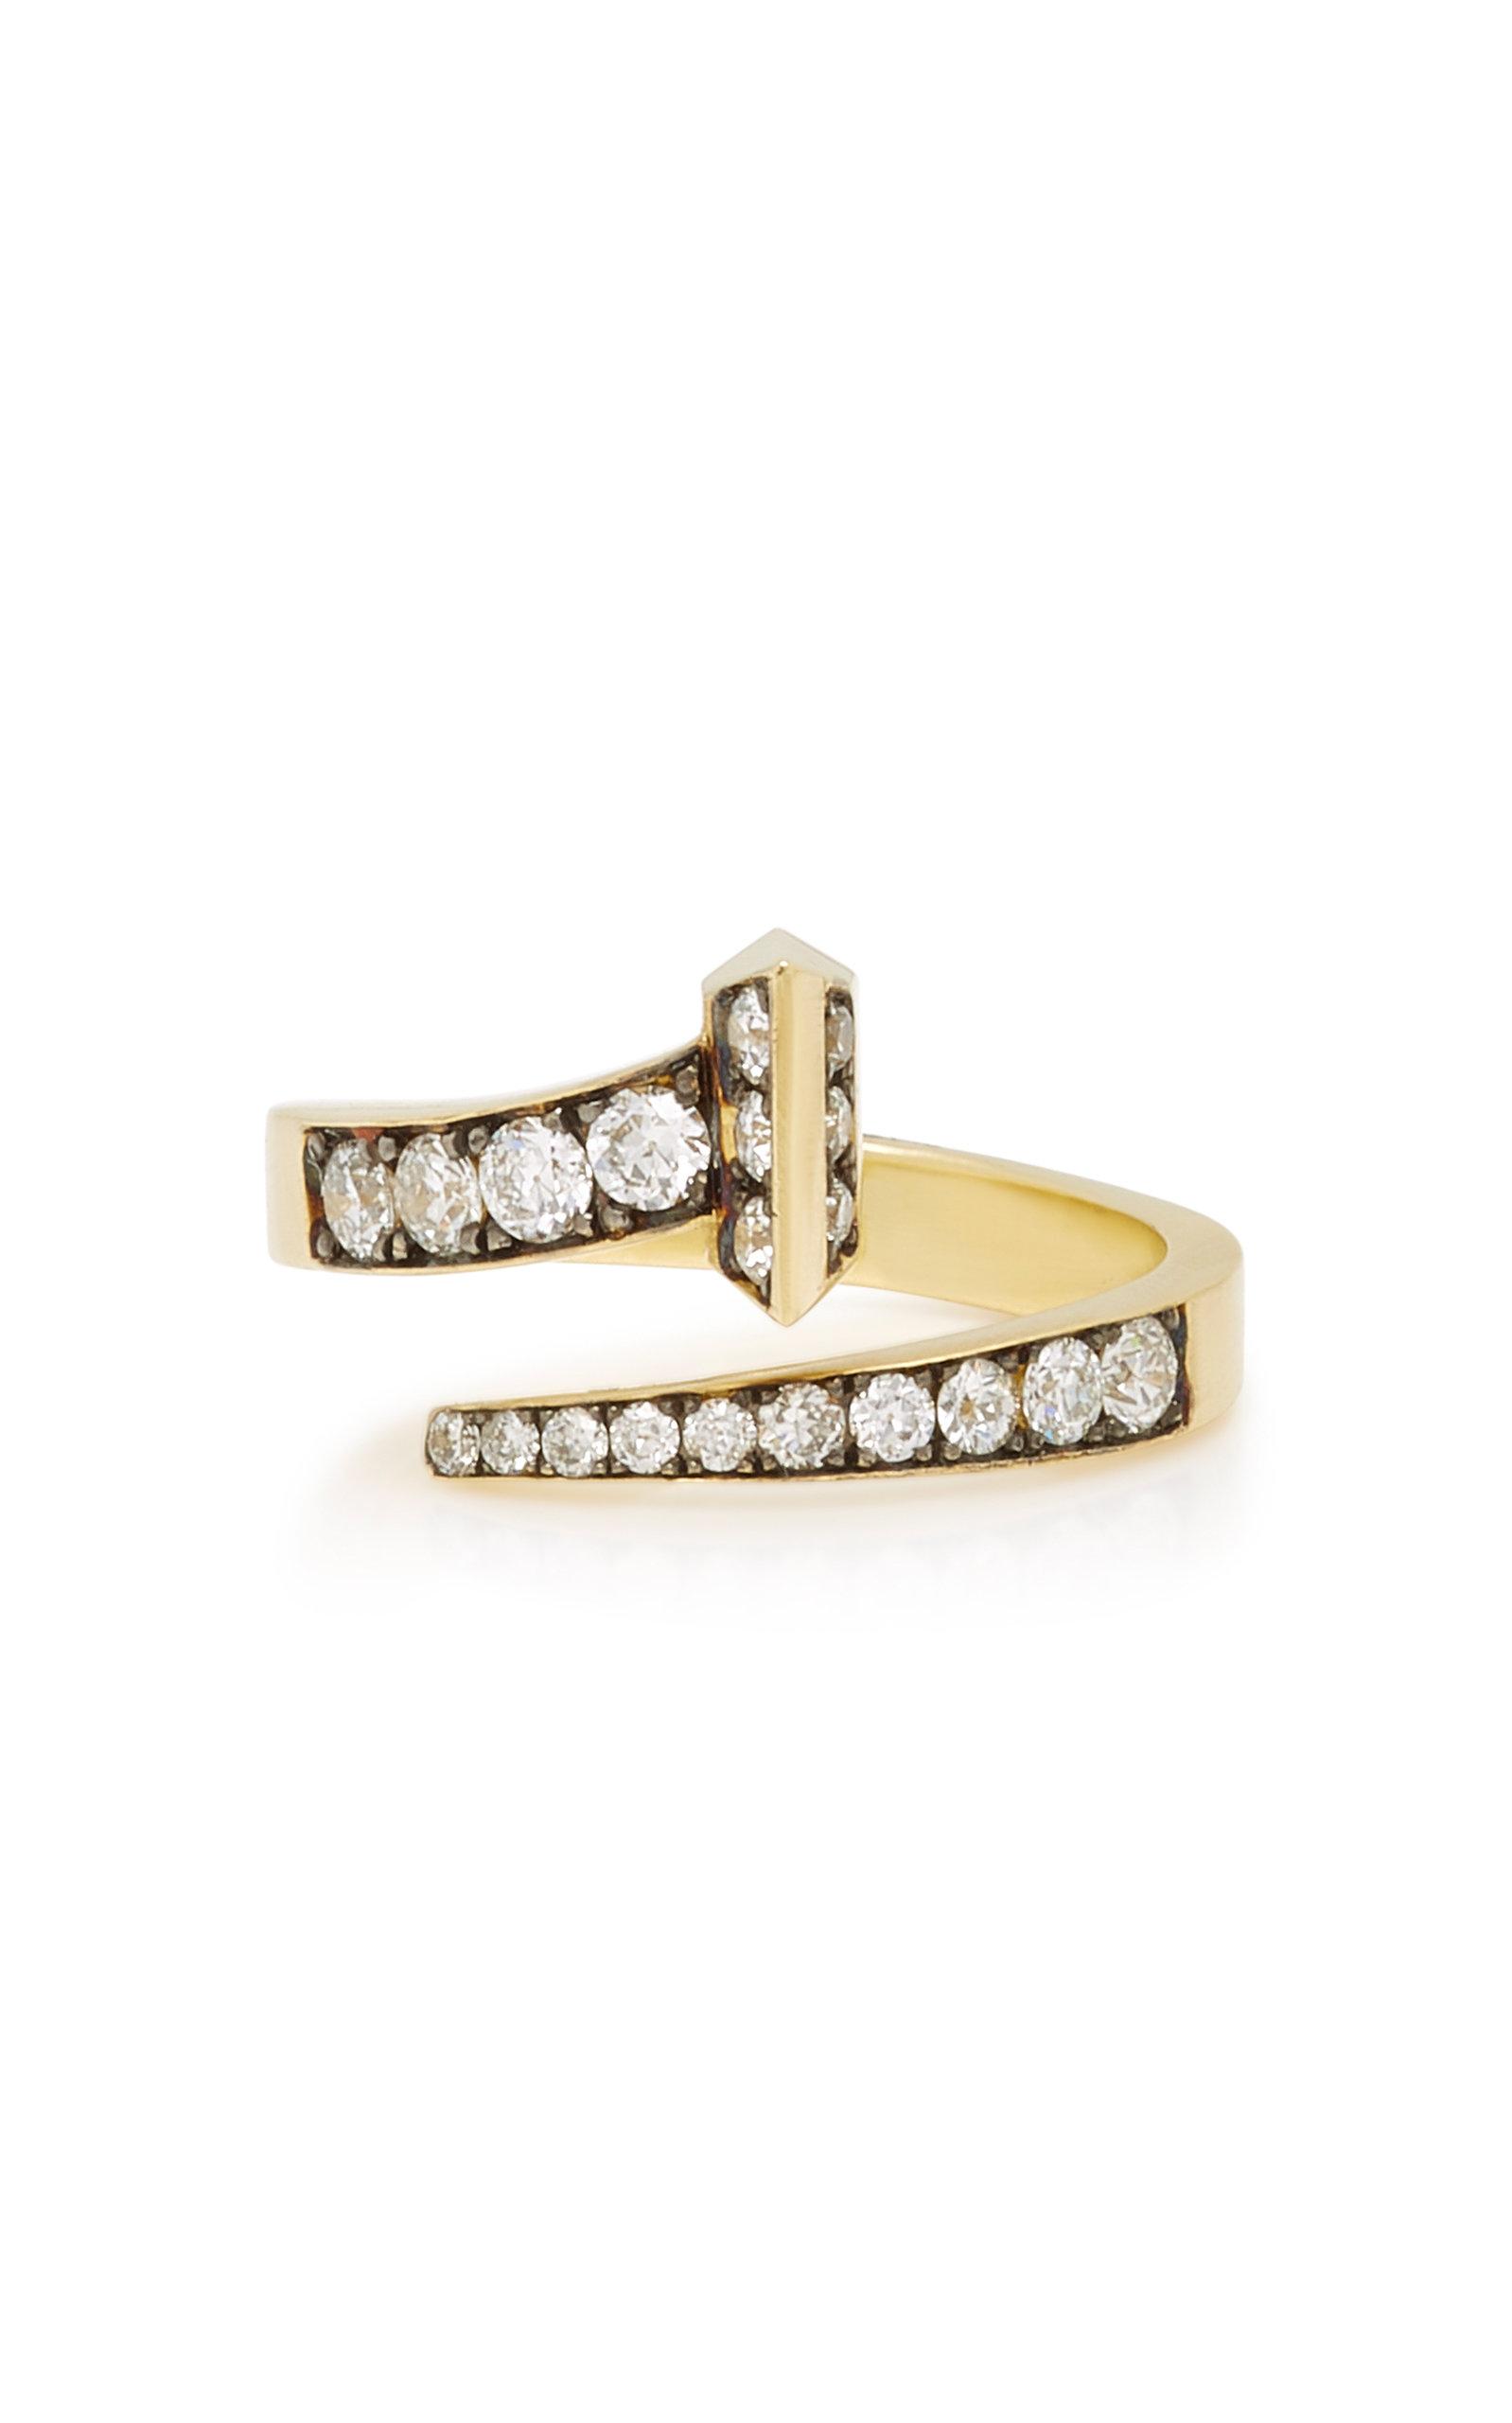 SYLVA & CIE EQUESTRIAN 18K GOLD DIAMOND RING